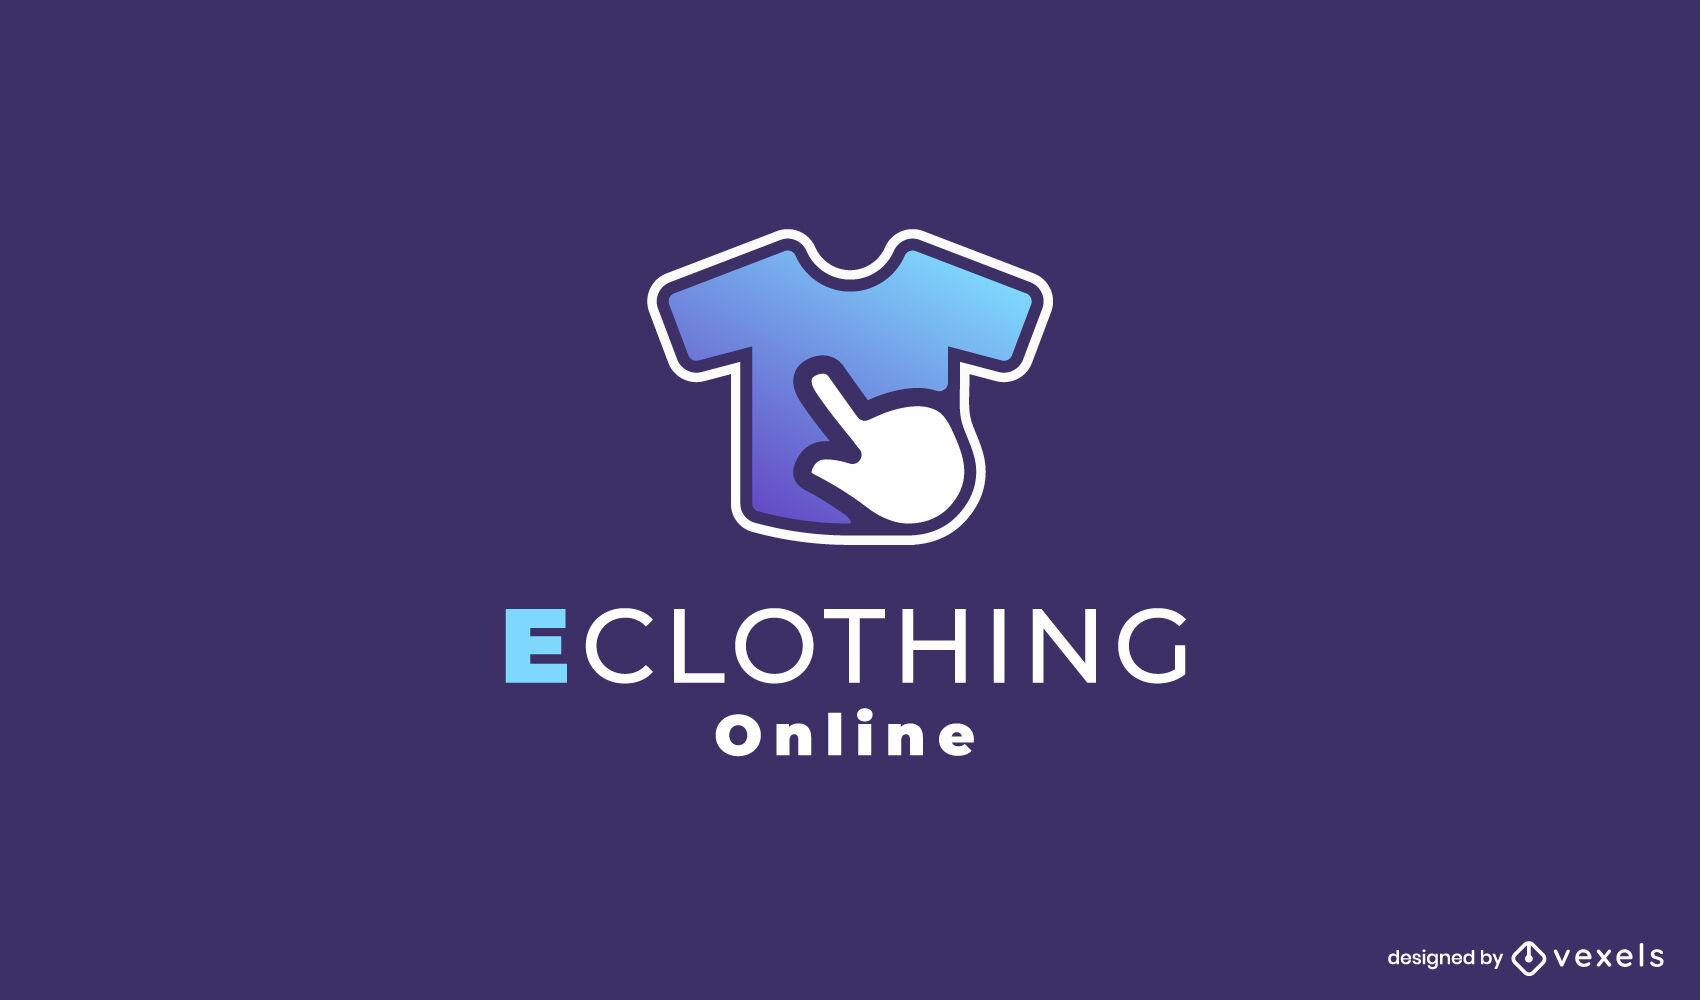 Tienda online de ropa camiseta logo degradado